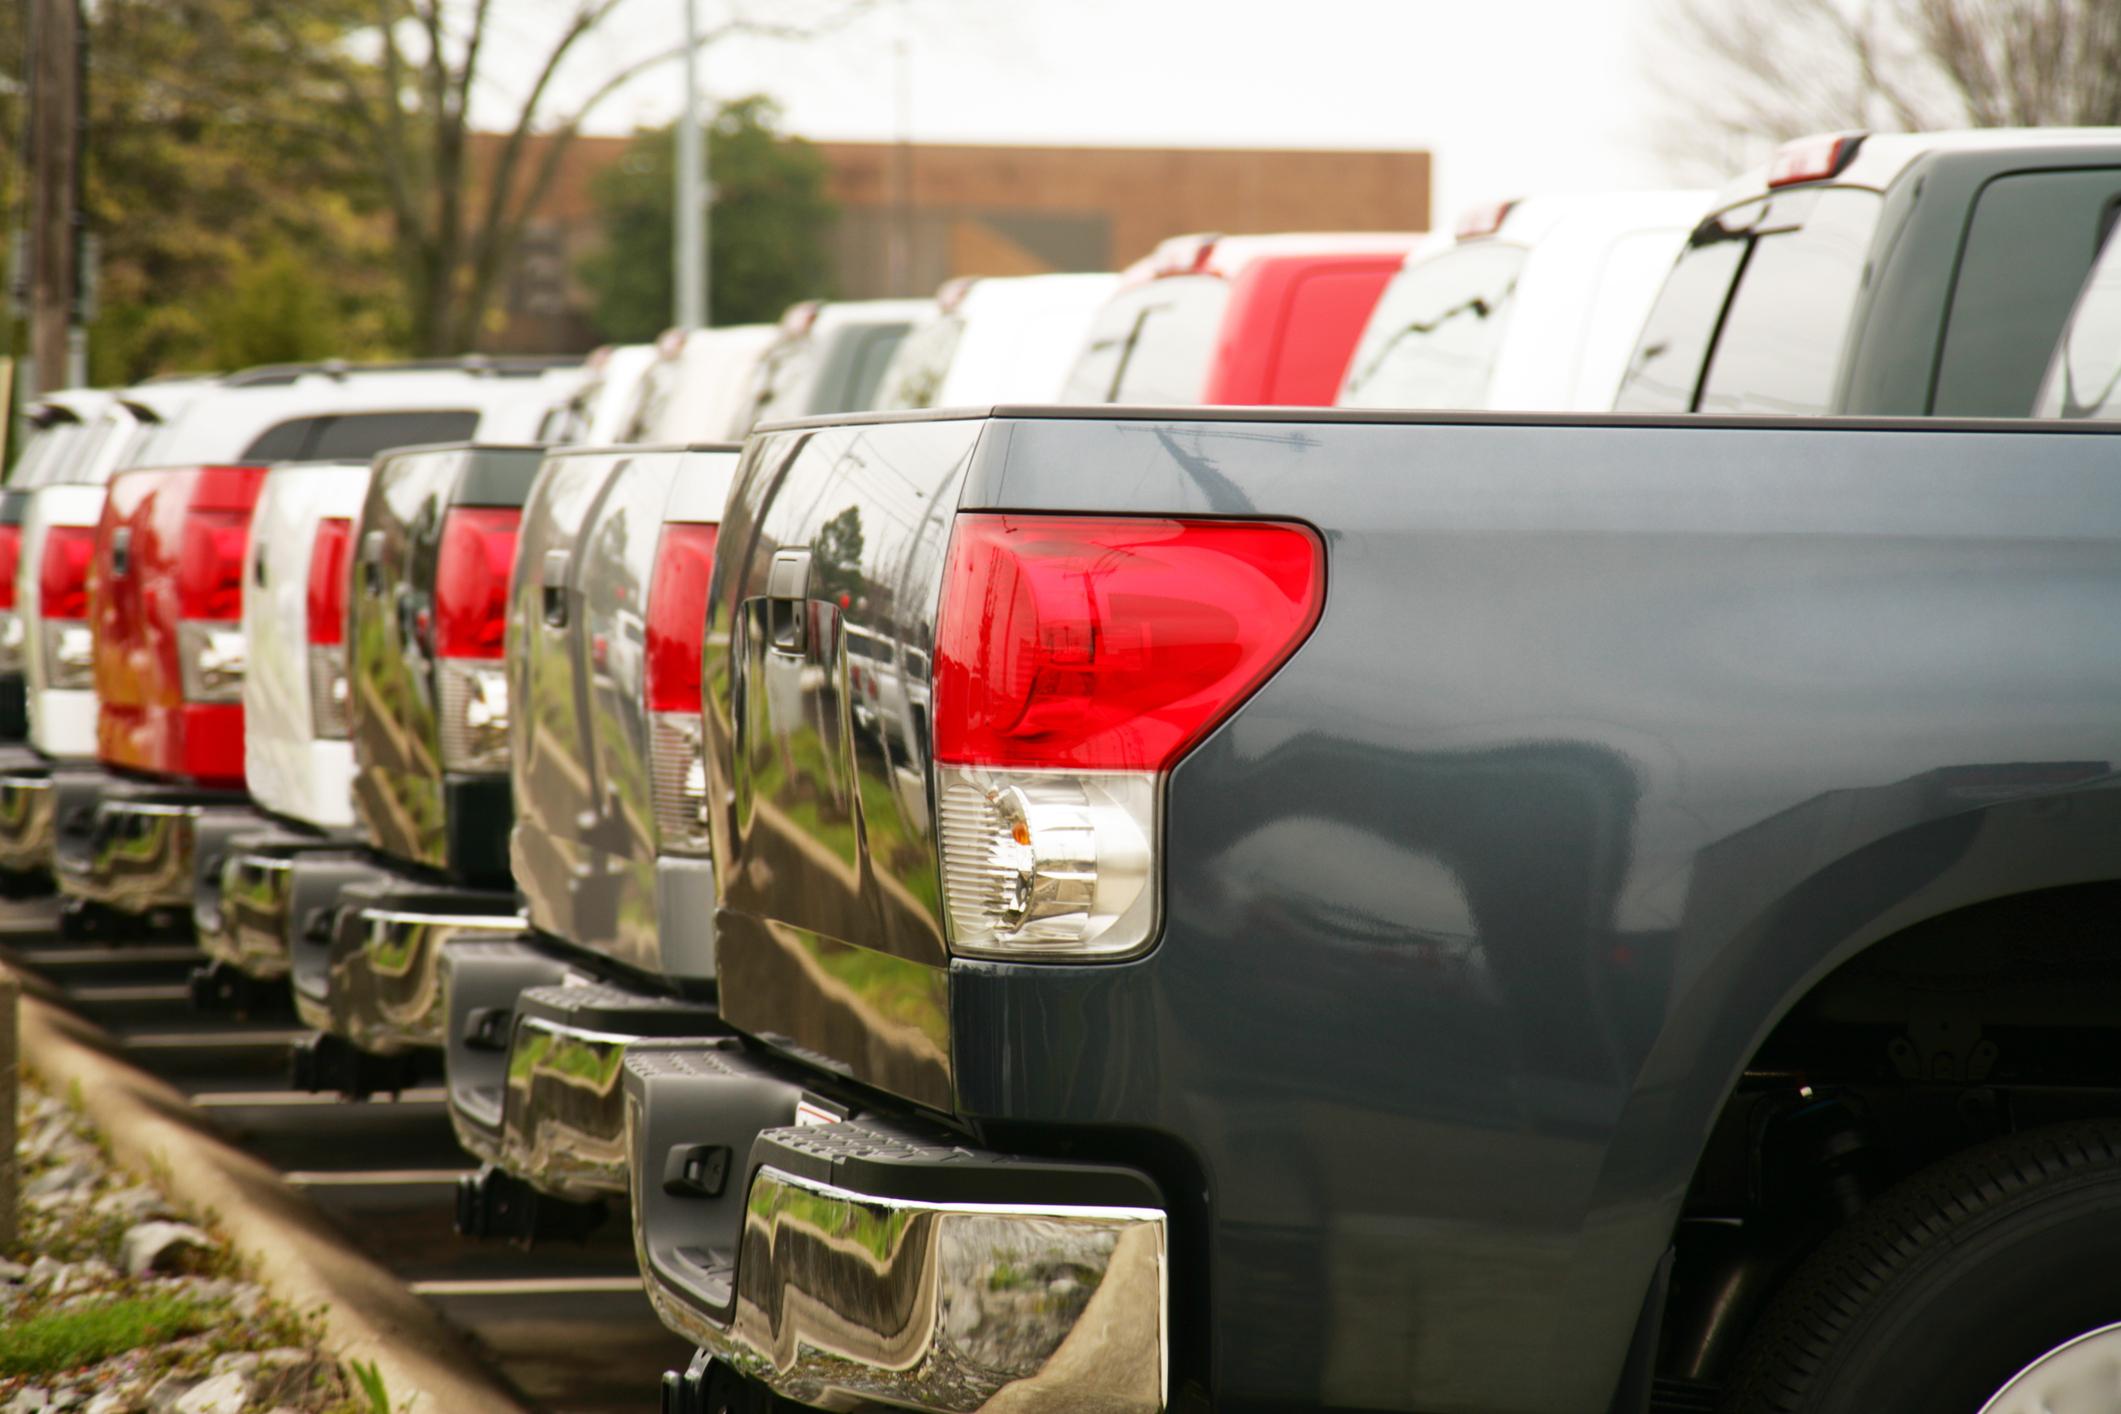 Row of trucks at a dealership lot